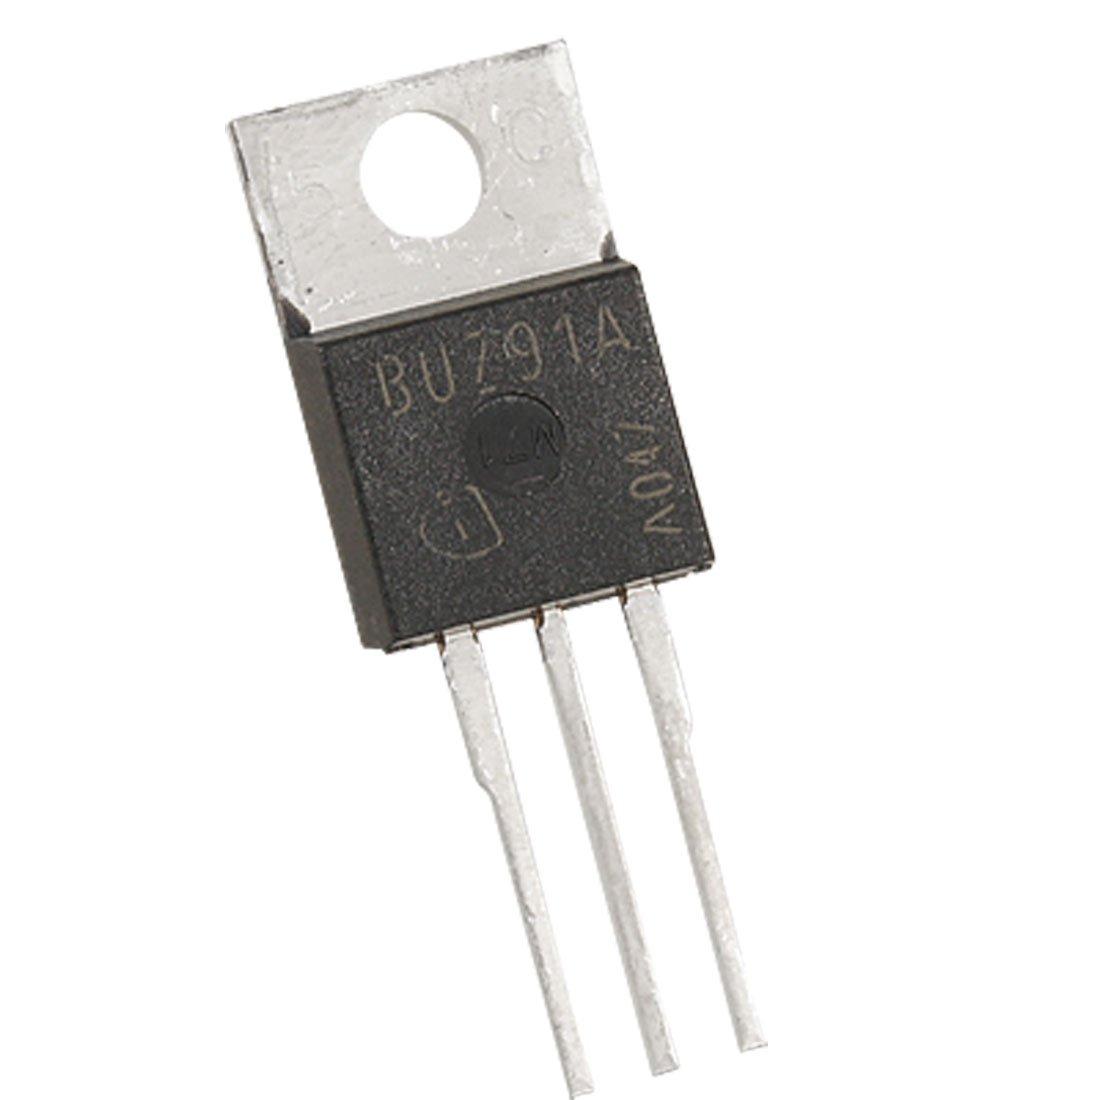 5 Pcs Buz91a 30v 60a N Channel Power Mosfet Transistors Amazonco Irfz44 Datasheet Diy Tools